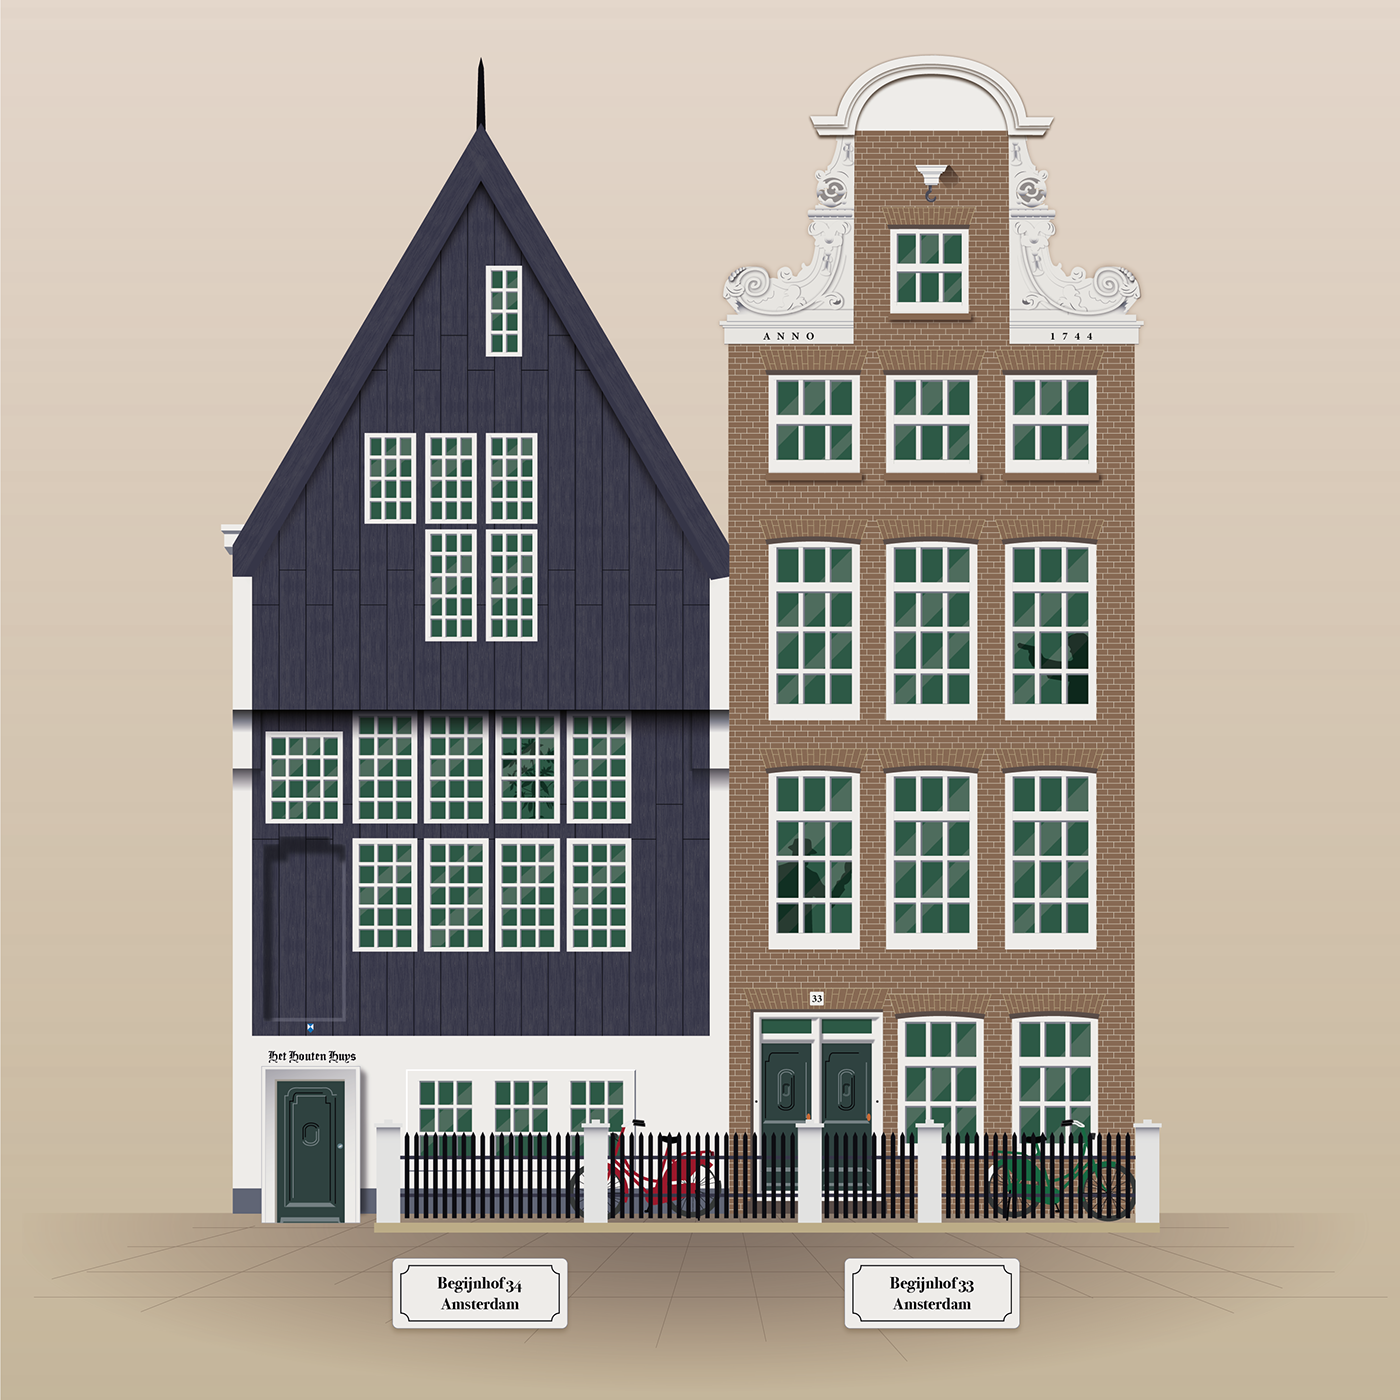 house facade amsterdam oldest building architecture Netherlands dutch historic